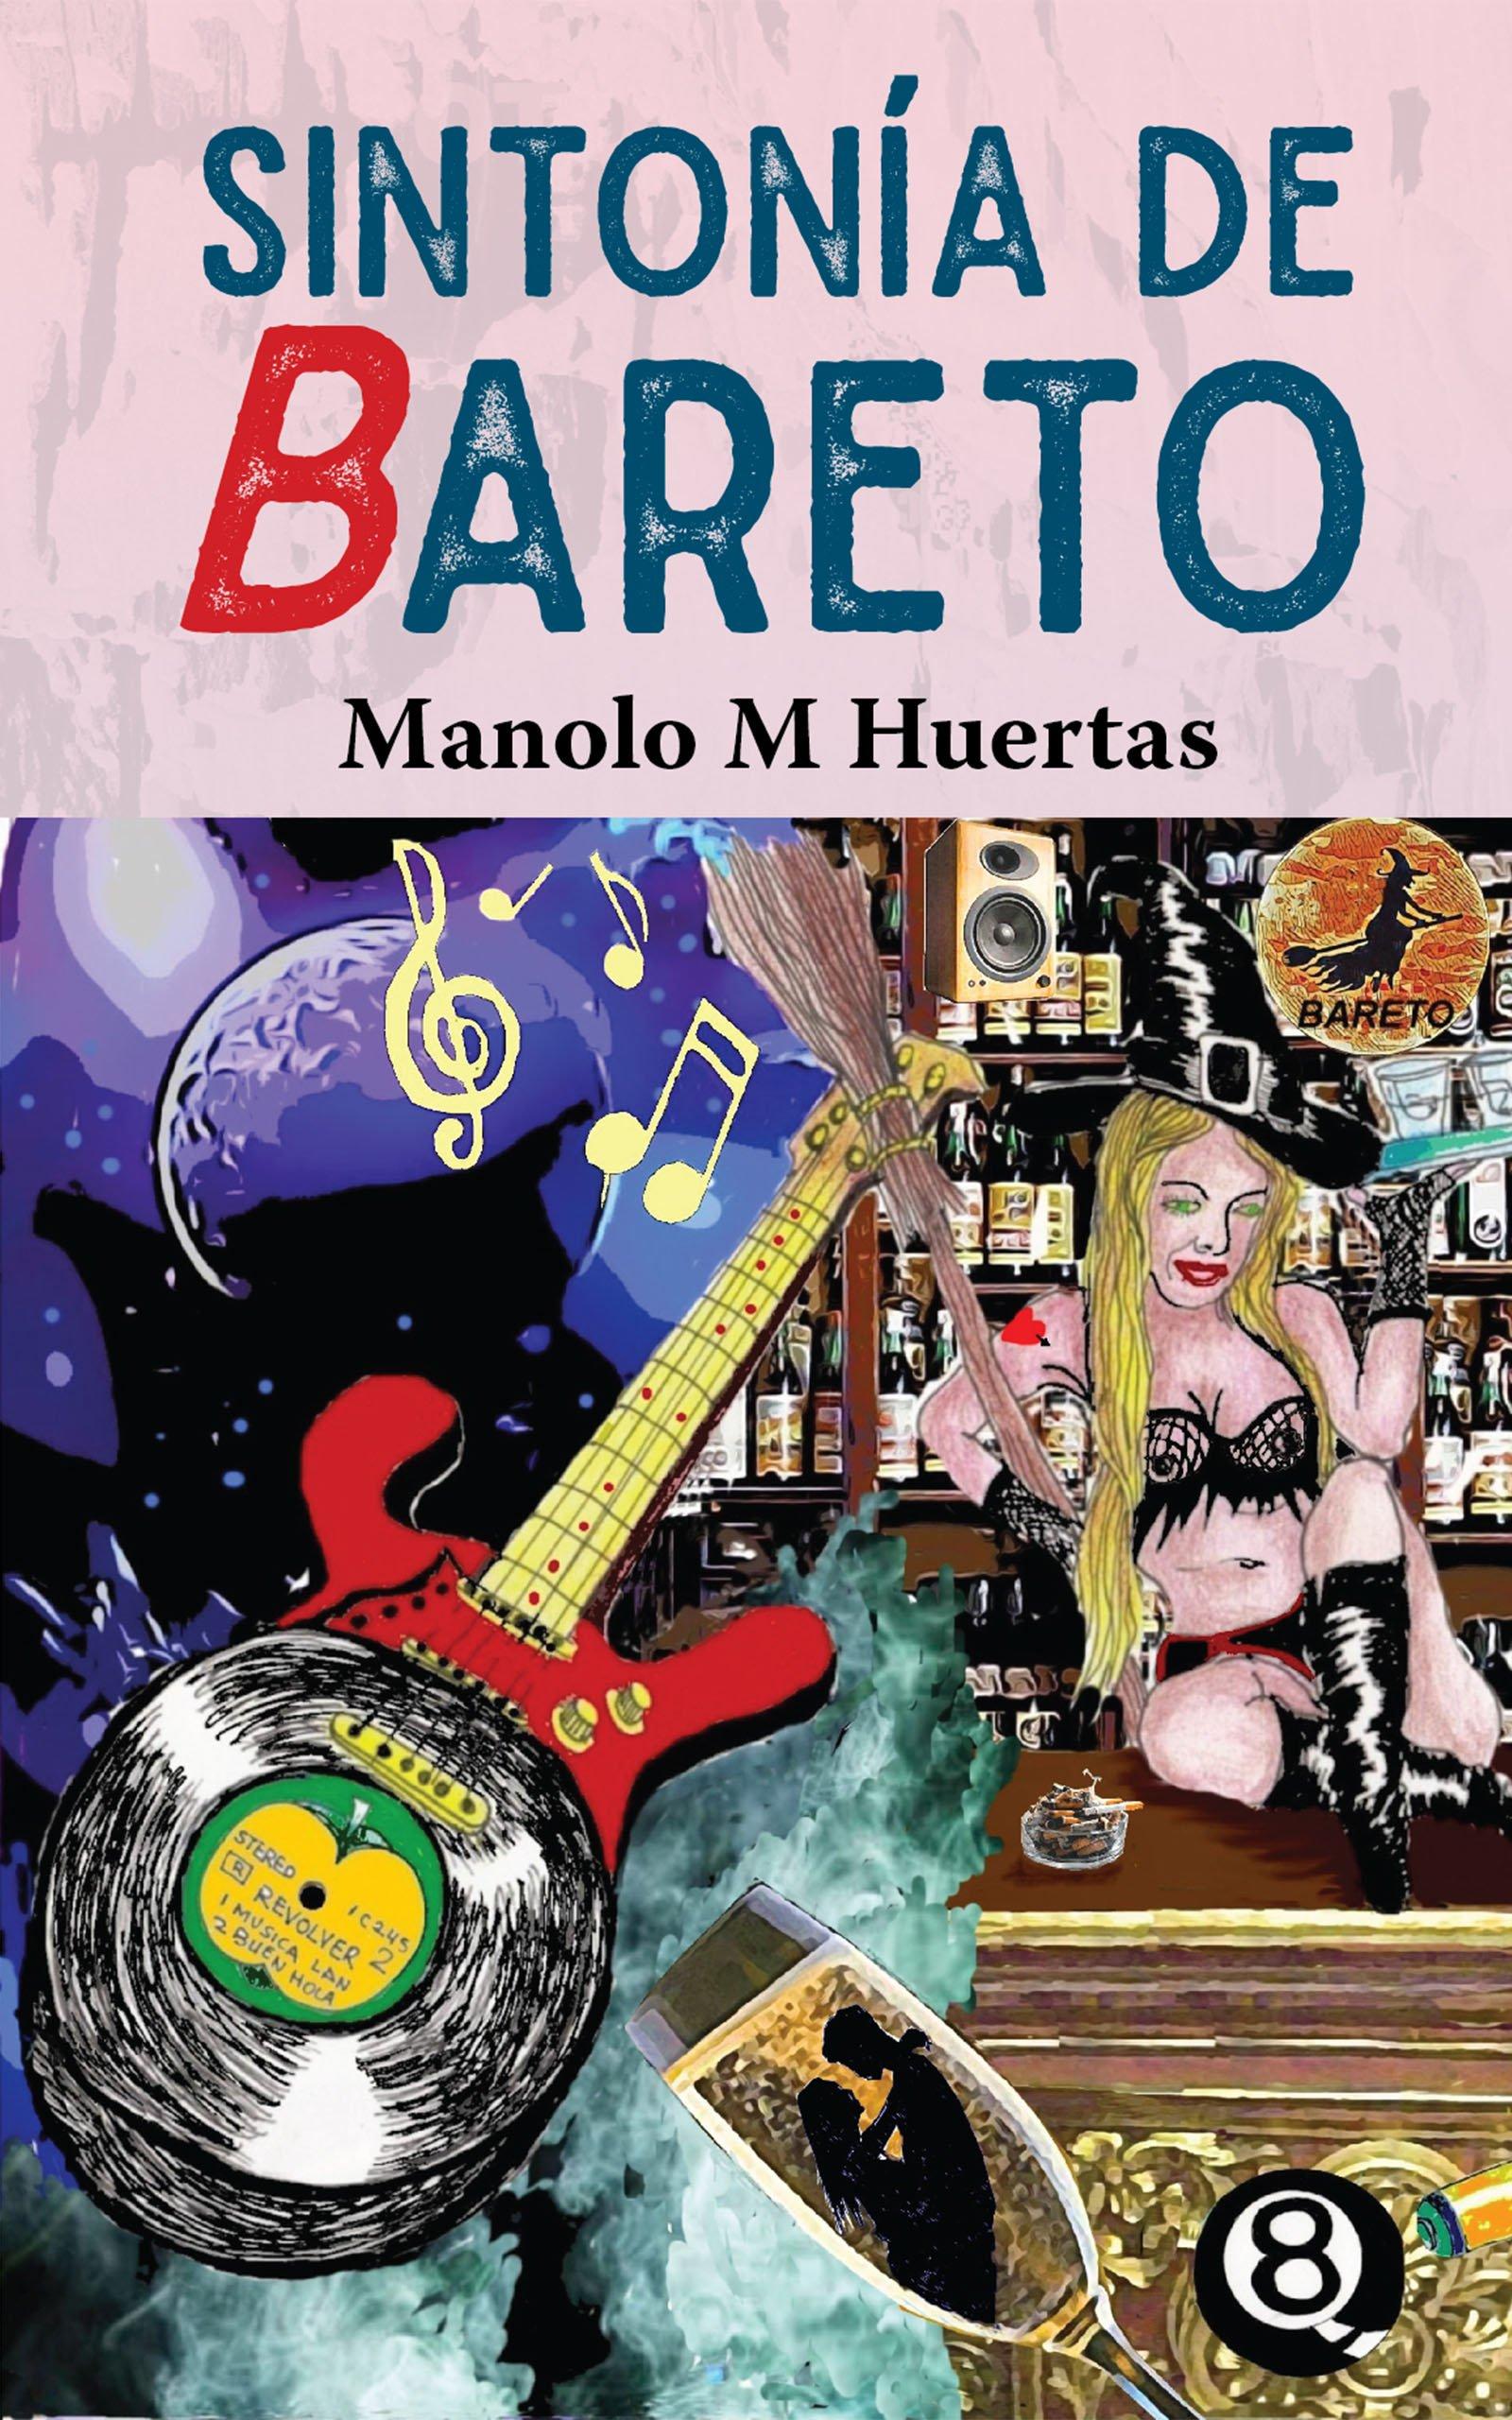 Sintonía de Bareto, de Manolo M Huertas